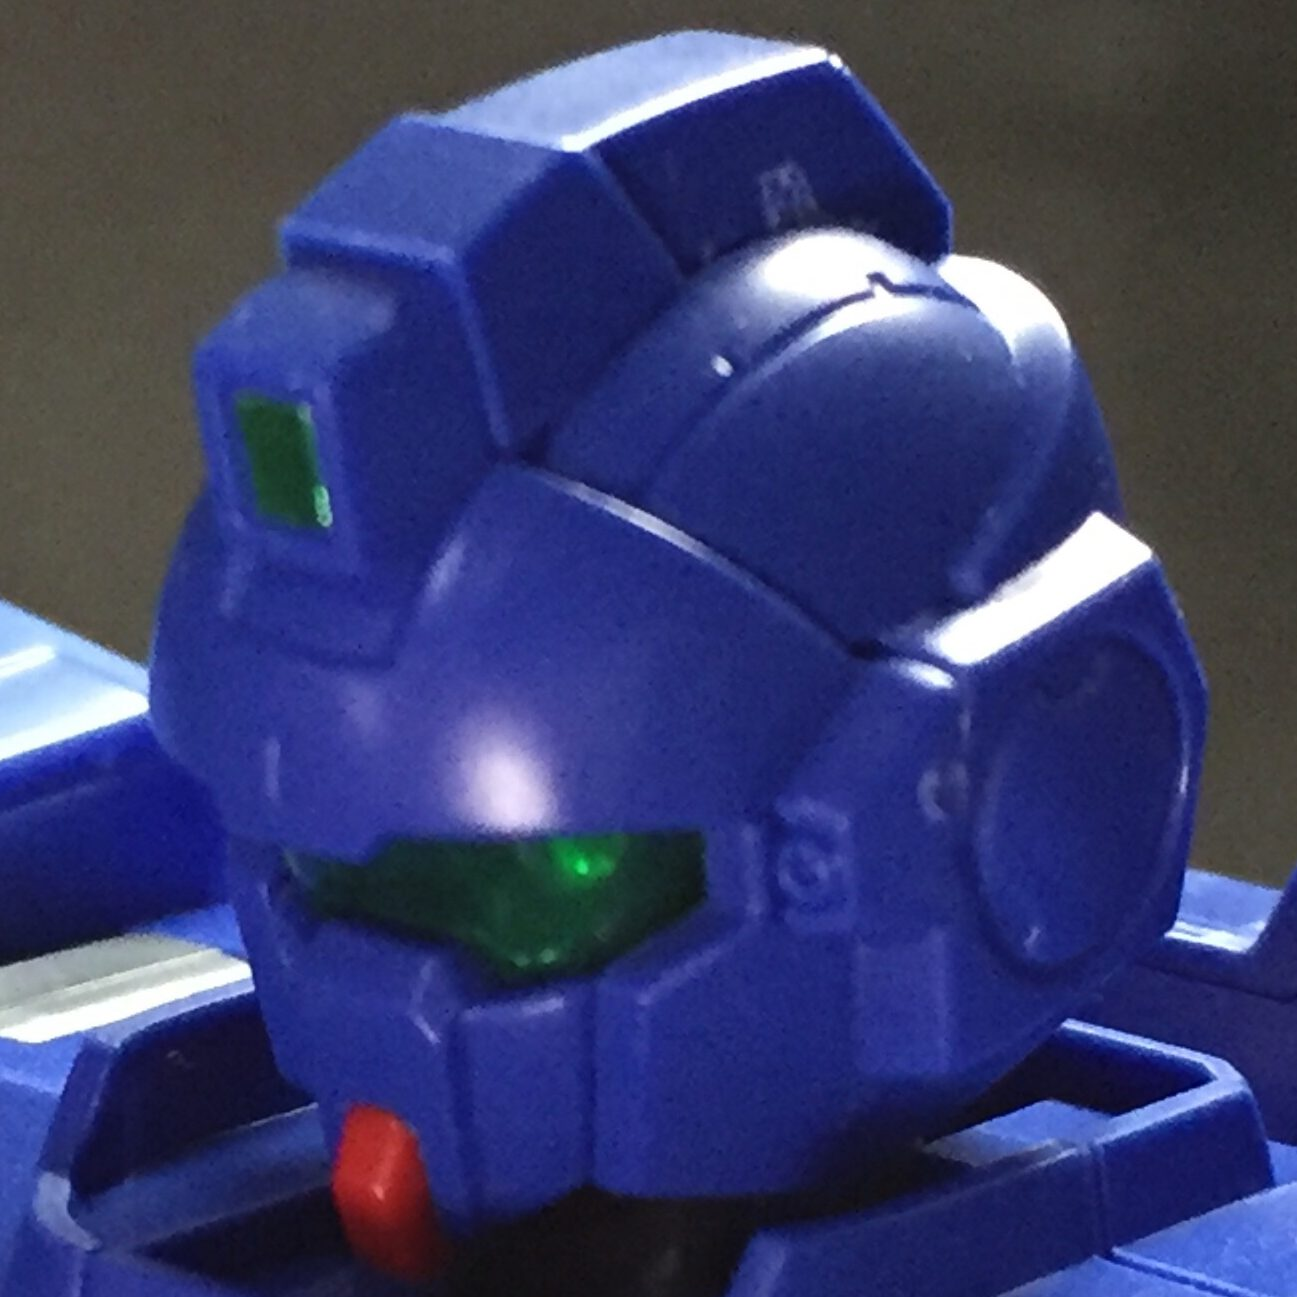 "HGUC207 1/144 RX-79BD-1 ブルーディスティニー1号機""EXAM"" BLUE DESTINY UNIT1 ""EXAM"" 頭部 head"